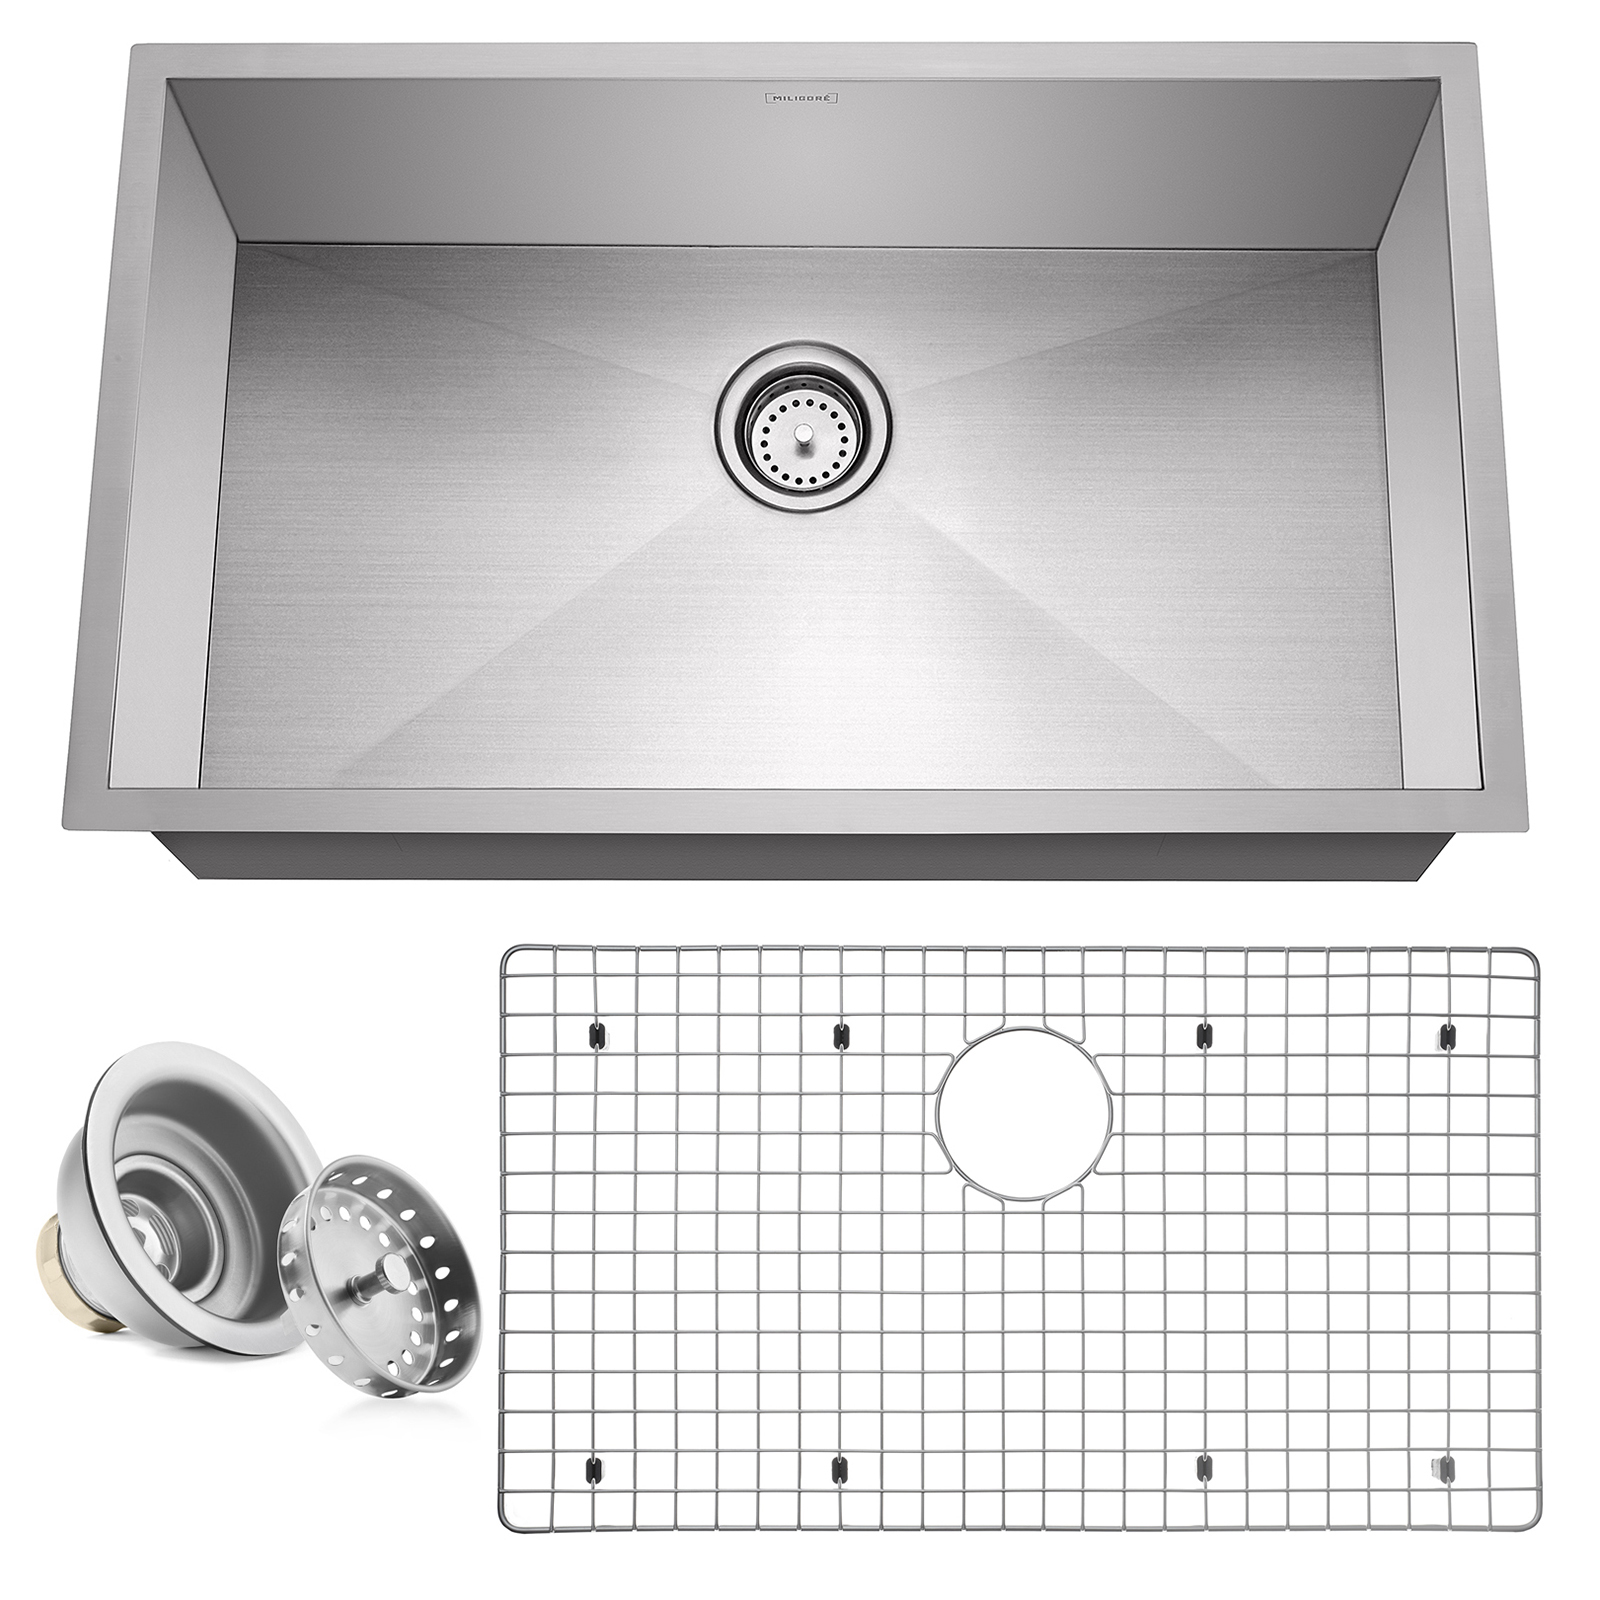 Miligore 10 Deep Single Bowl Undermount Zero Radius 16 Gauge Stainless Steel Kitchen Sink Includes Drain Grid Walmart Com Walmart Com